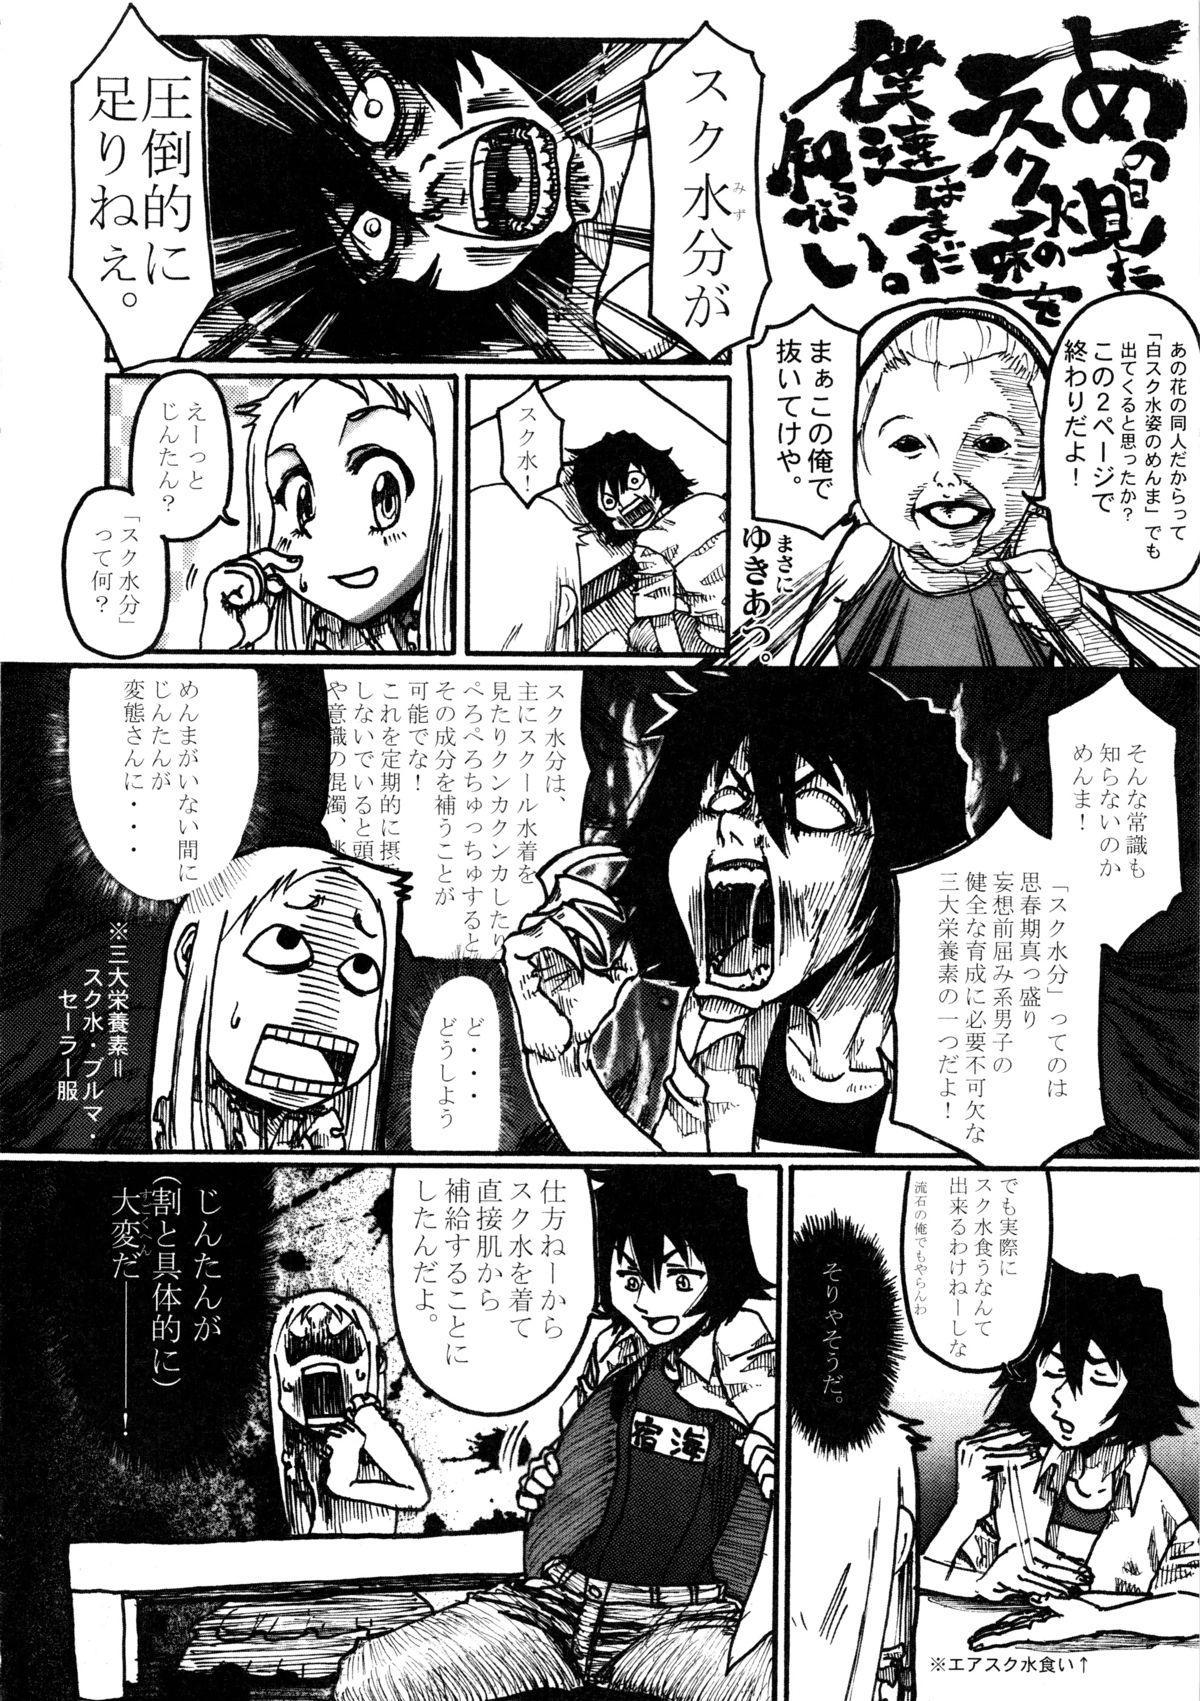 School-mer! School Mizugi Bloomer Joshi Anthology 126